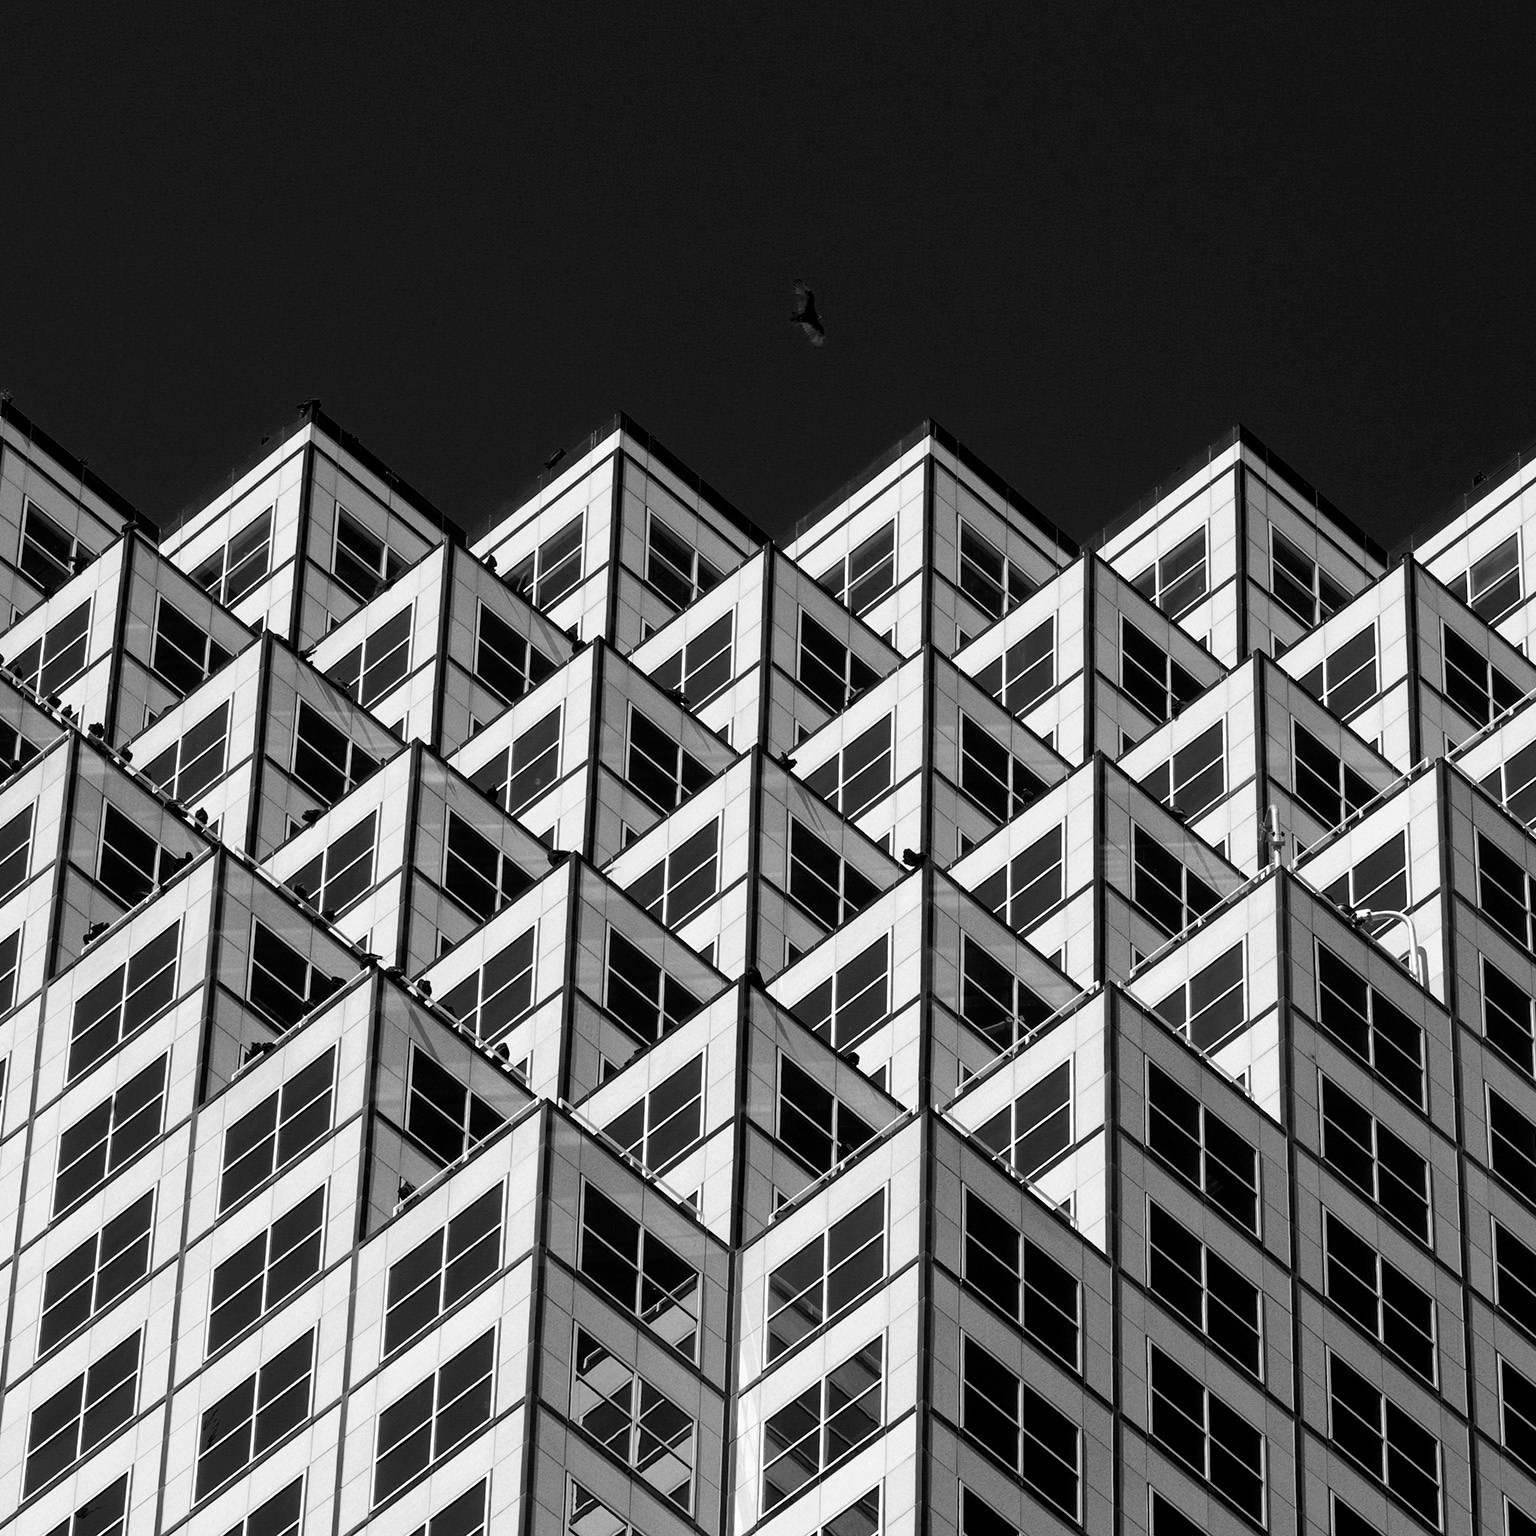 Miami Downtown 1, Black and White Architectural Photograph, 2014